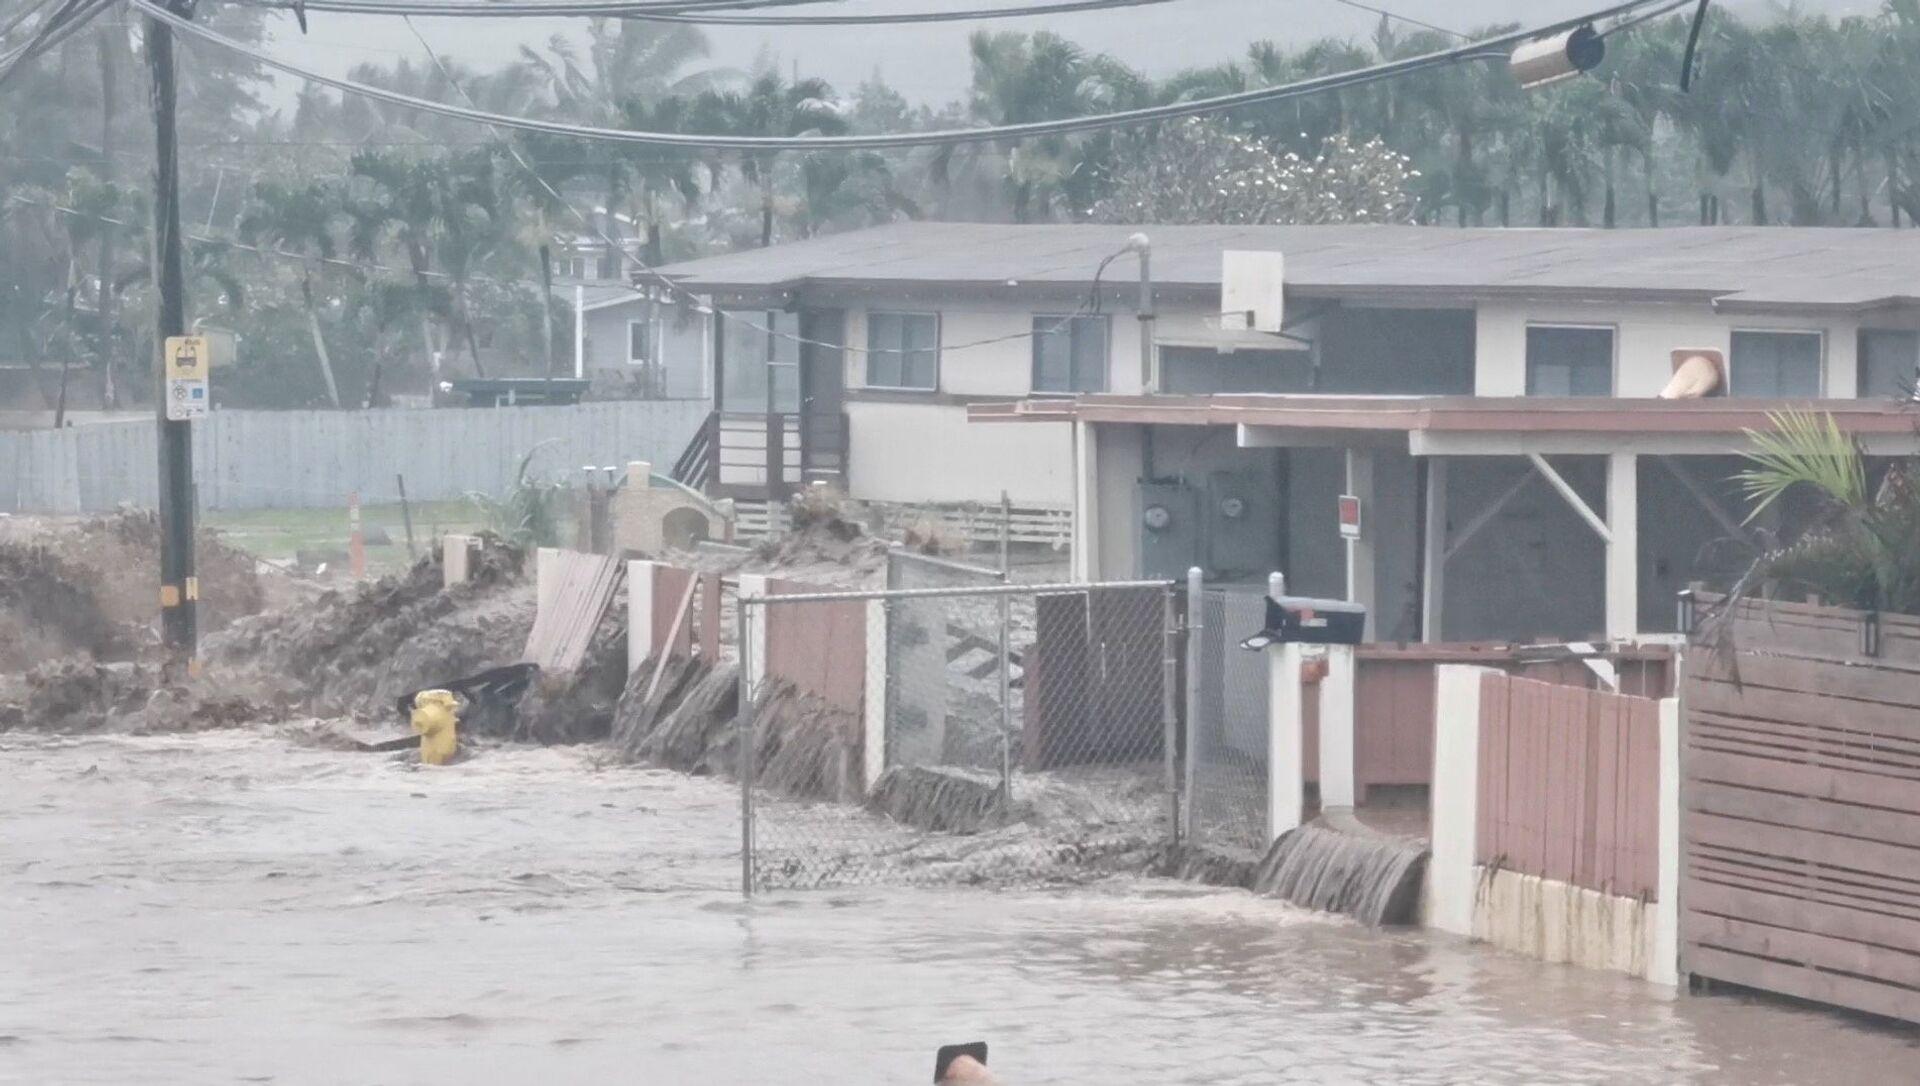 Social media video grab shows floodwaters streaming down a street in Hauula, Hawaii - Sputnik Italia, 1920, 11.03.2021